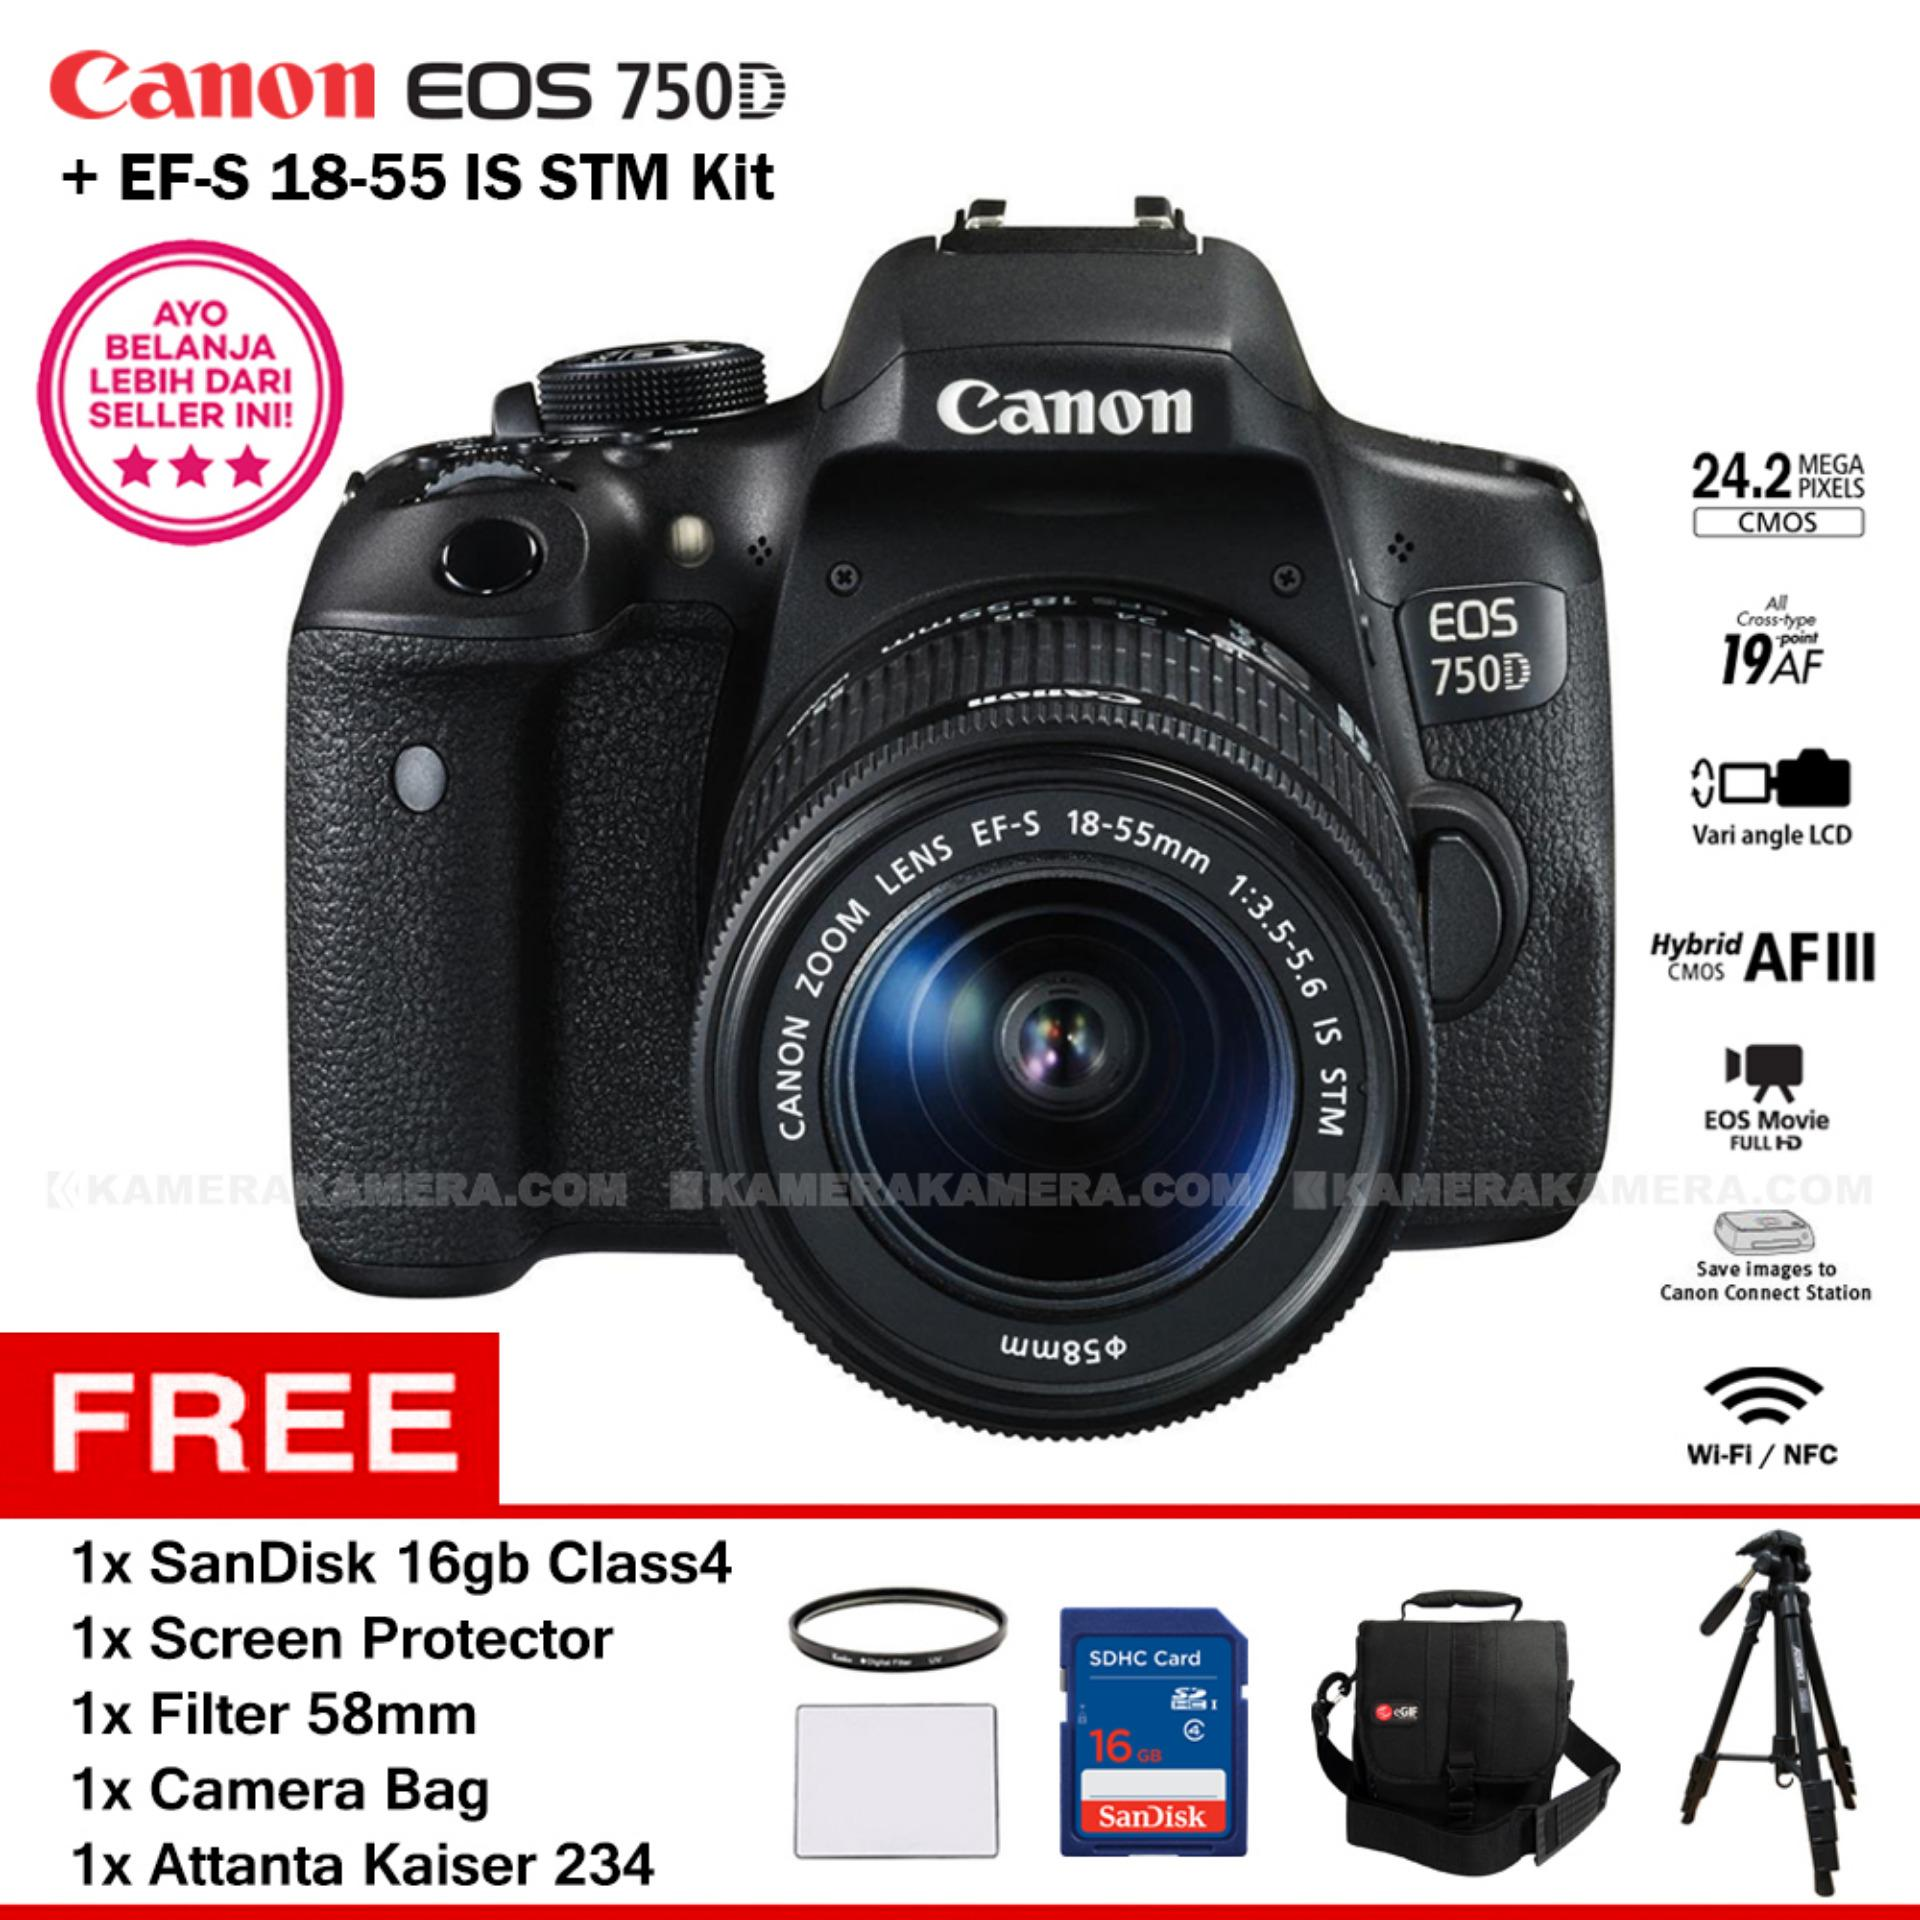 Jual Kamera Slr Terbaru Nikon Coolpix L340 Paket Canon Eos 750d Ef S 18 55 Is Stm Kit Lens Wifi 242